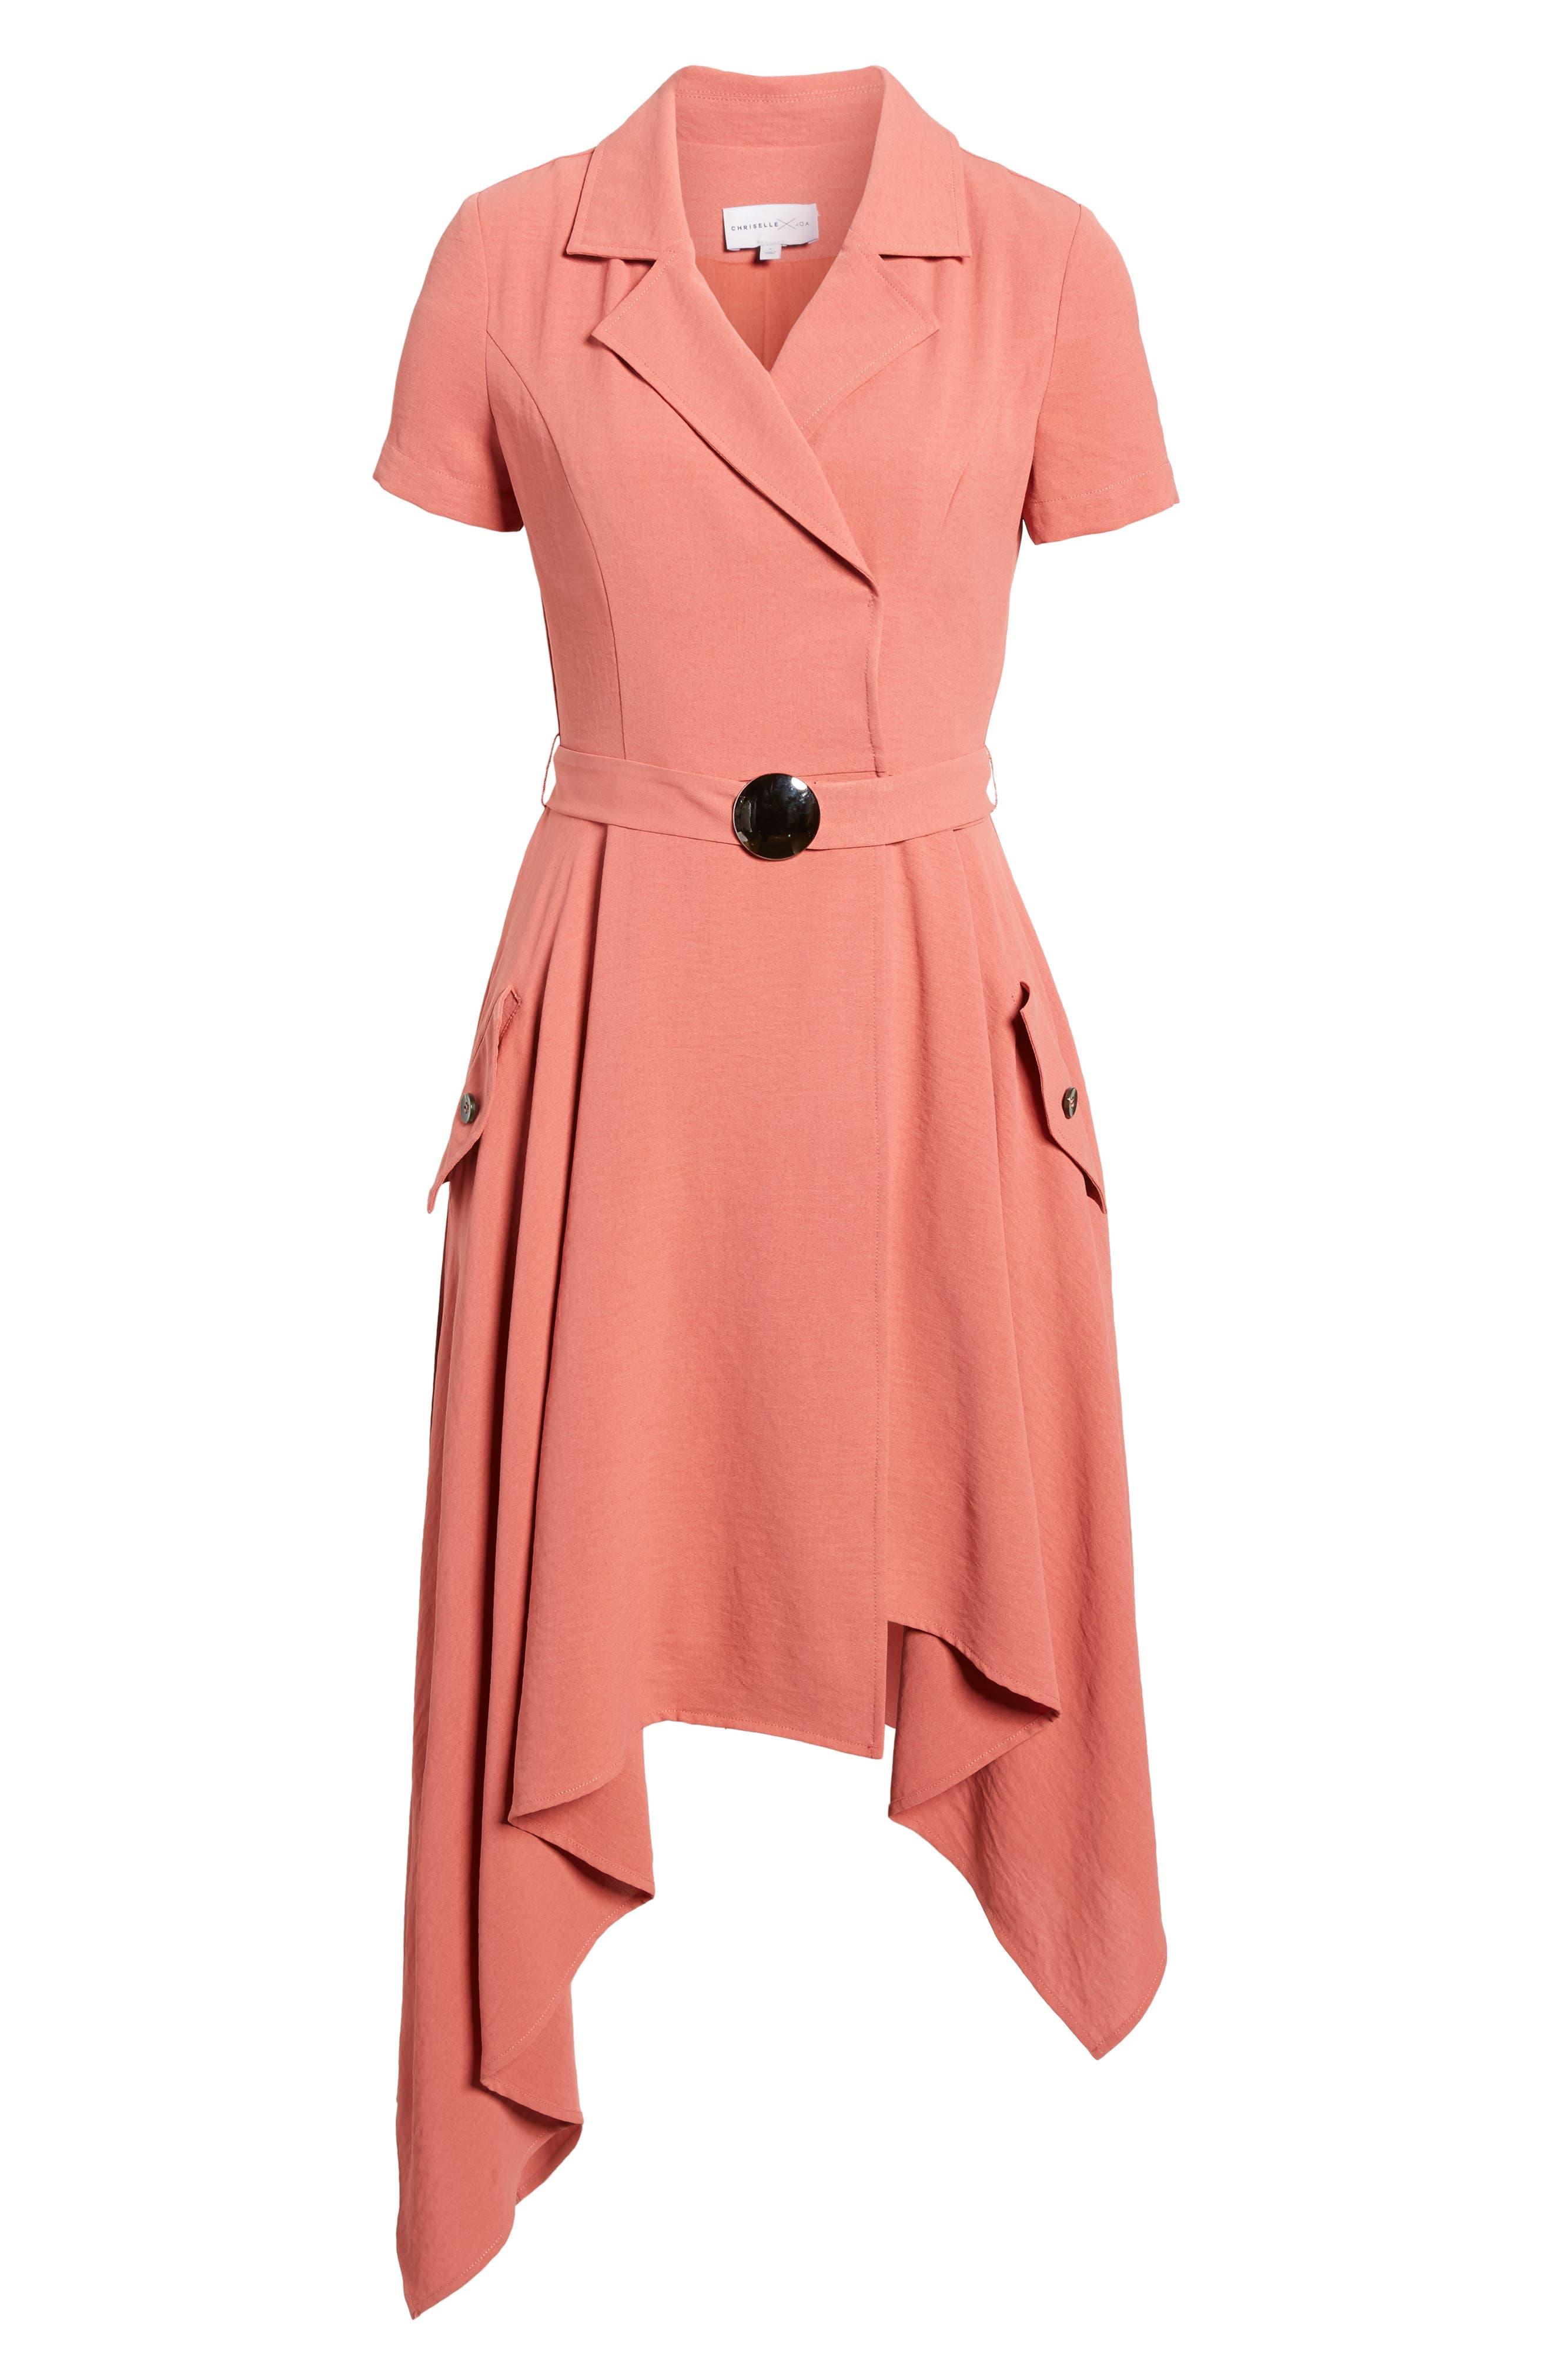 Chriselle x J.O.A. Asymmetrical Trench Dress,                             Alternate thumbnail 8, color,                             Patina